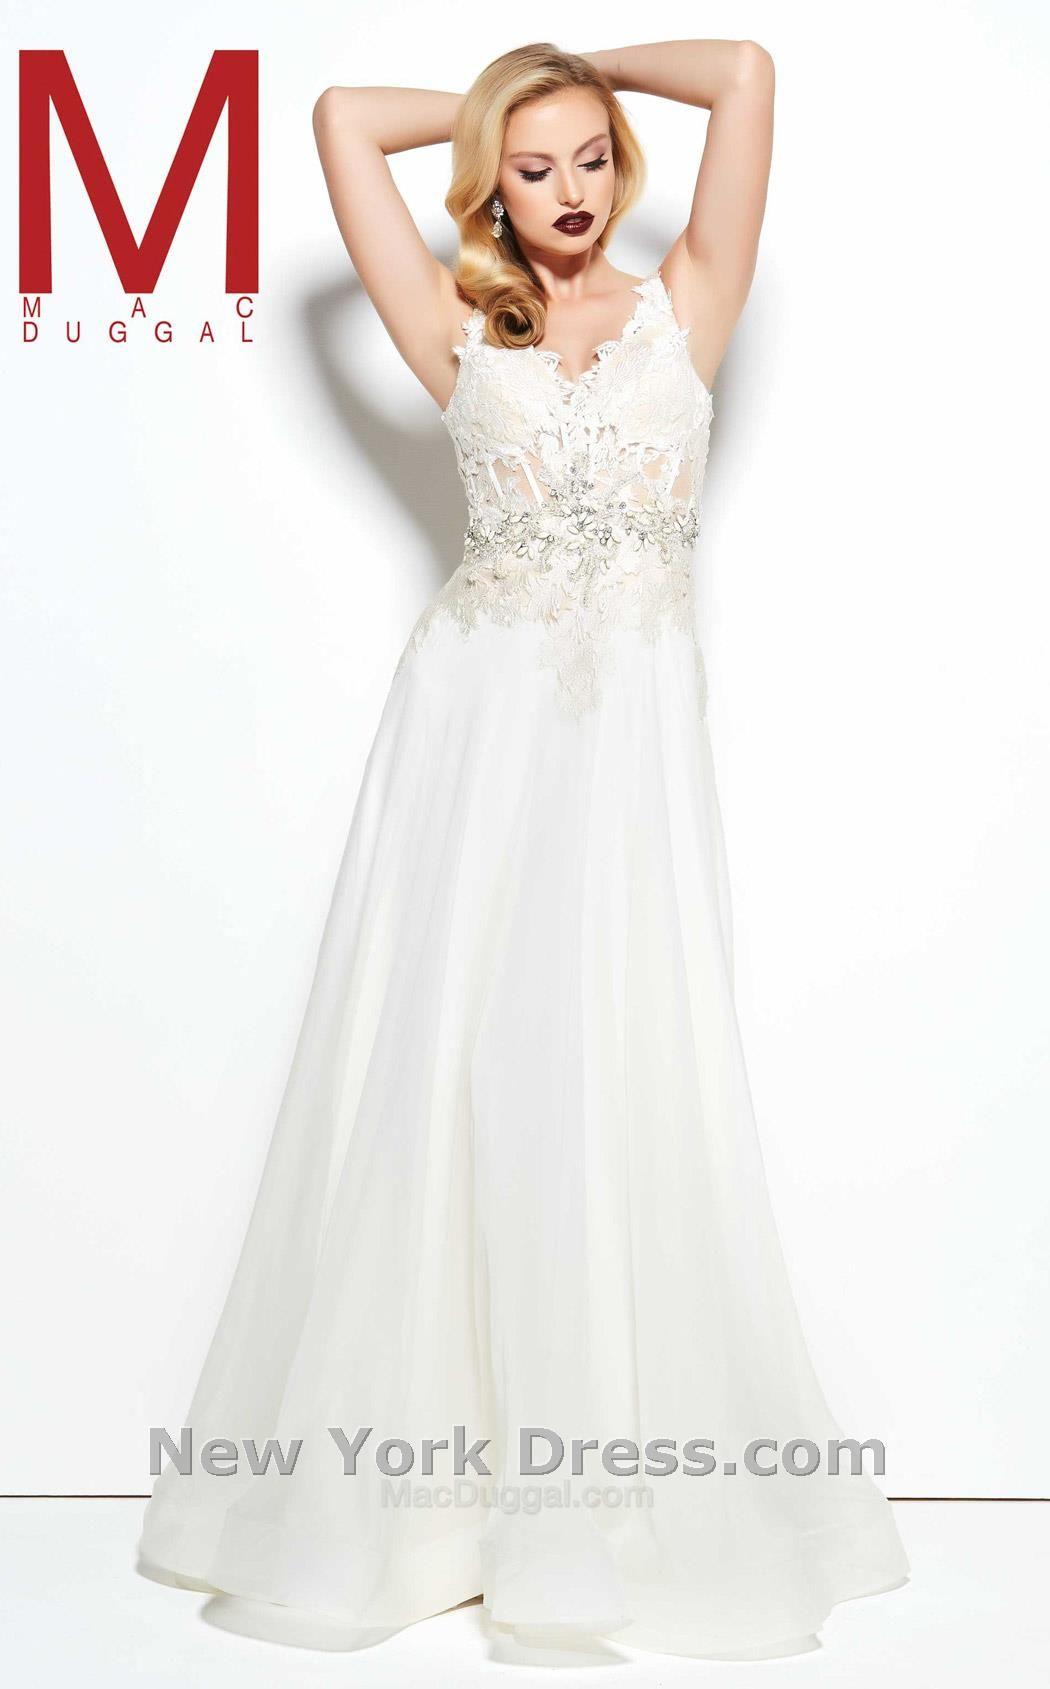 Mac duggal r thumbnail my favorite wedding dresses